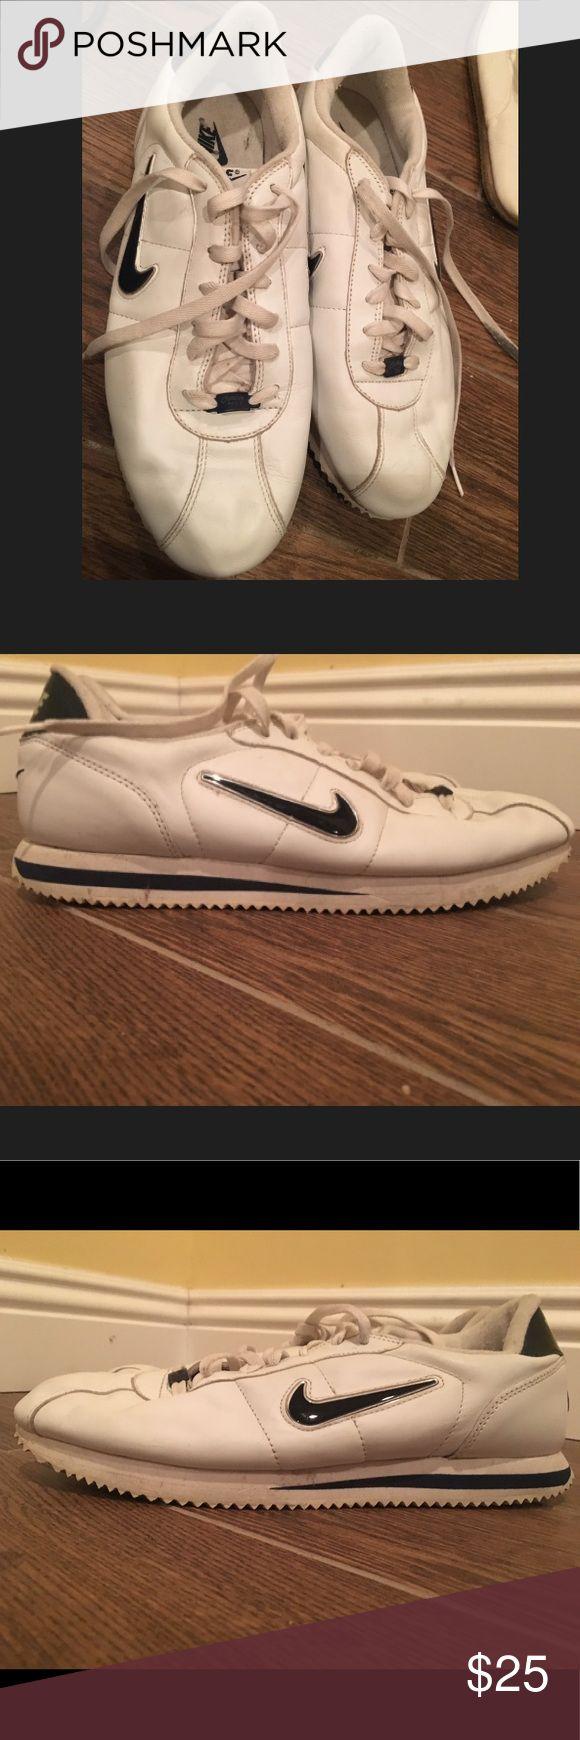 Nike Cortez '72. Mens US size 11.5. Nike Cortez '72 White Shoes Mens US size 11.5. Nike Shoes